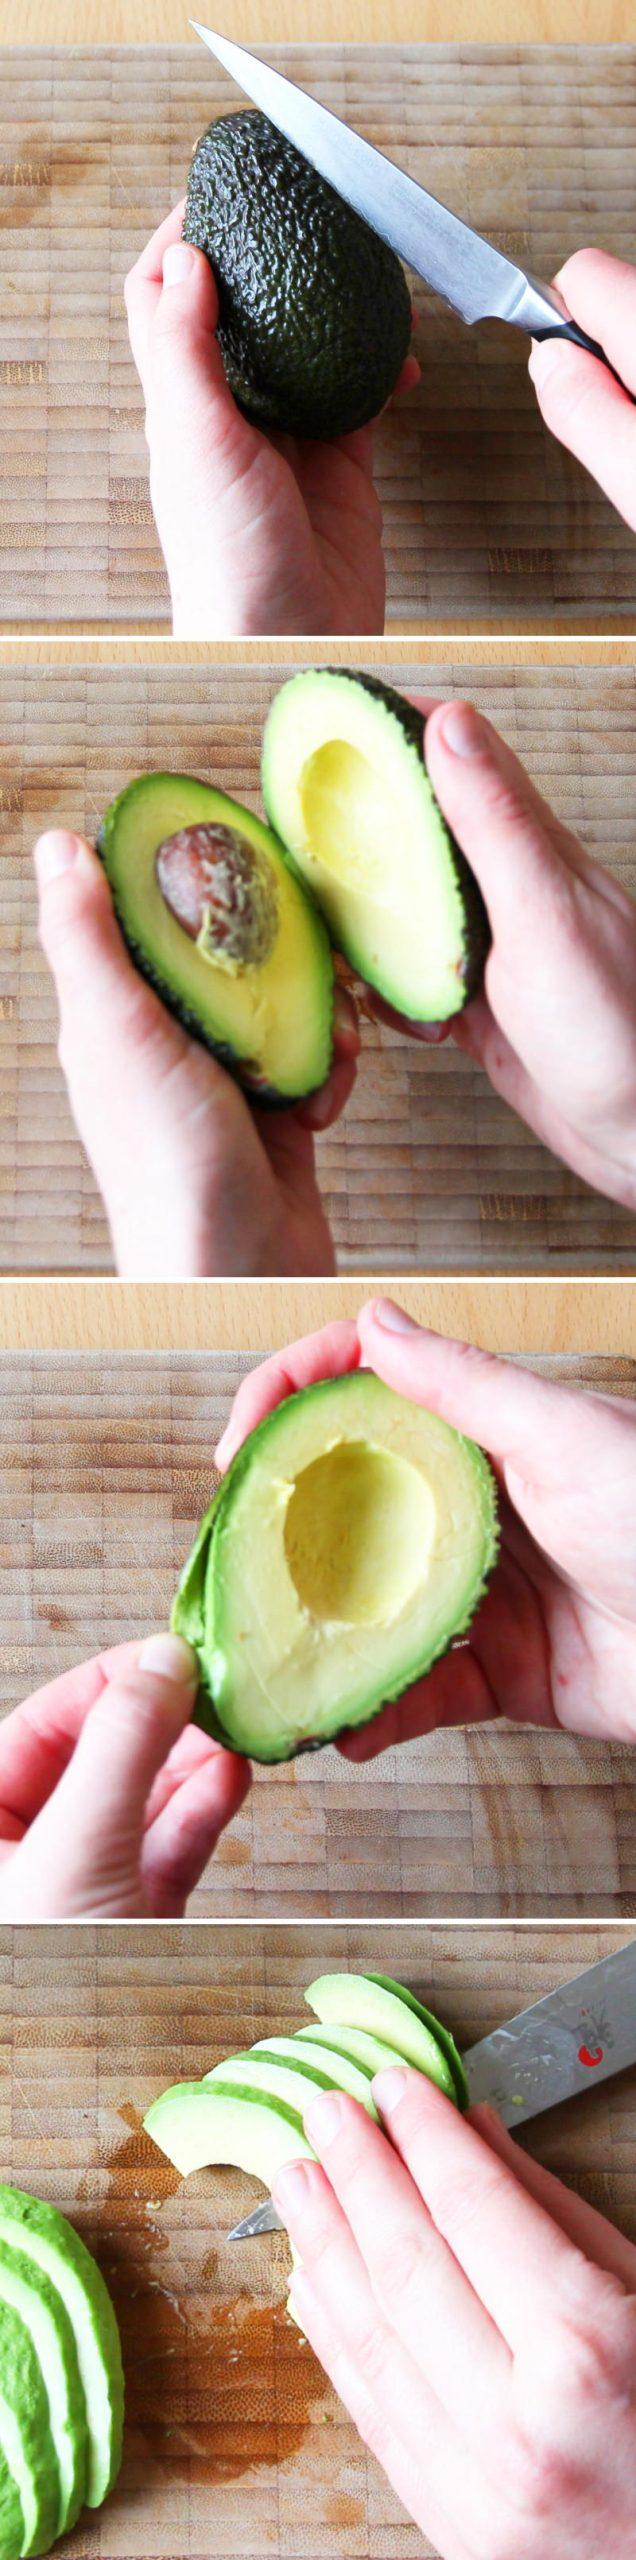 Sushi Bowl Schritt 3 Avocado vorbereiten